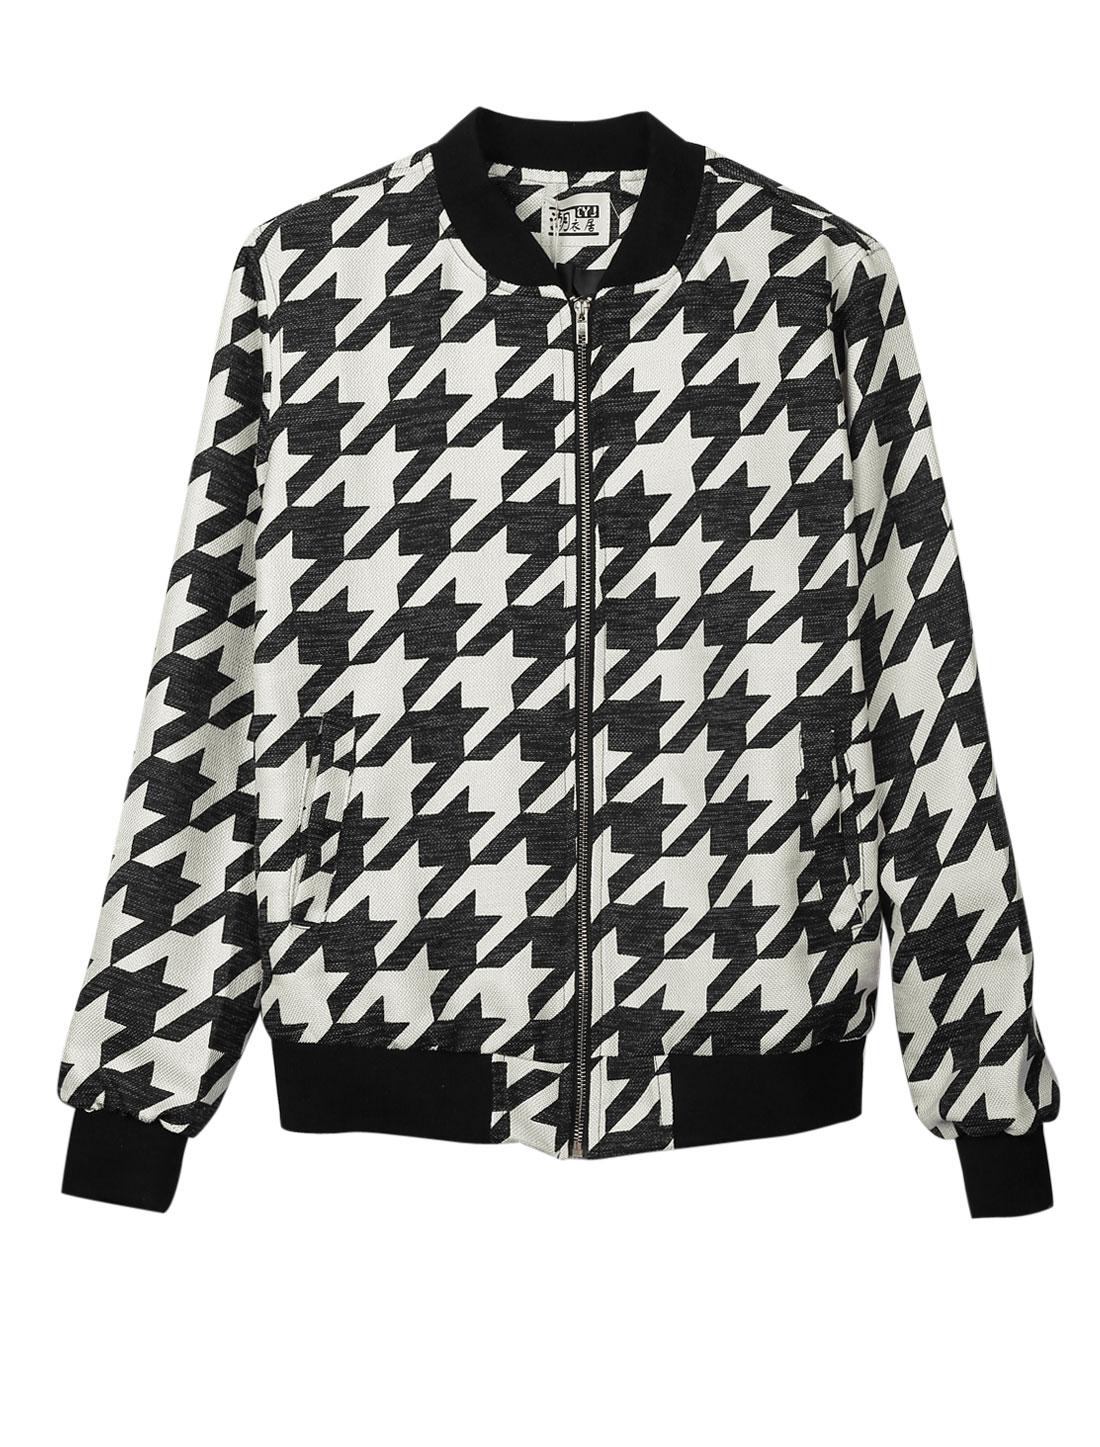 Men Stand Collar Houndstooth Pattern Zip Up Chic Jacket Black Beige S